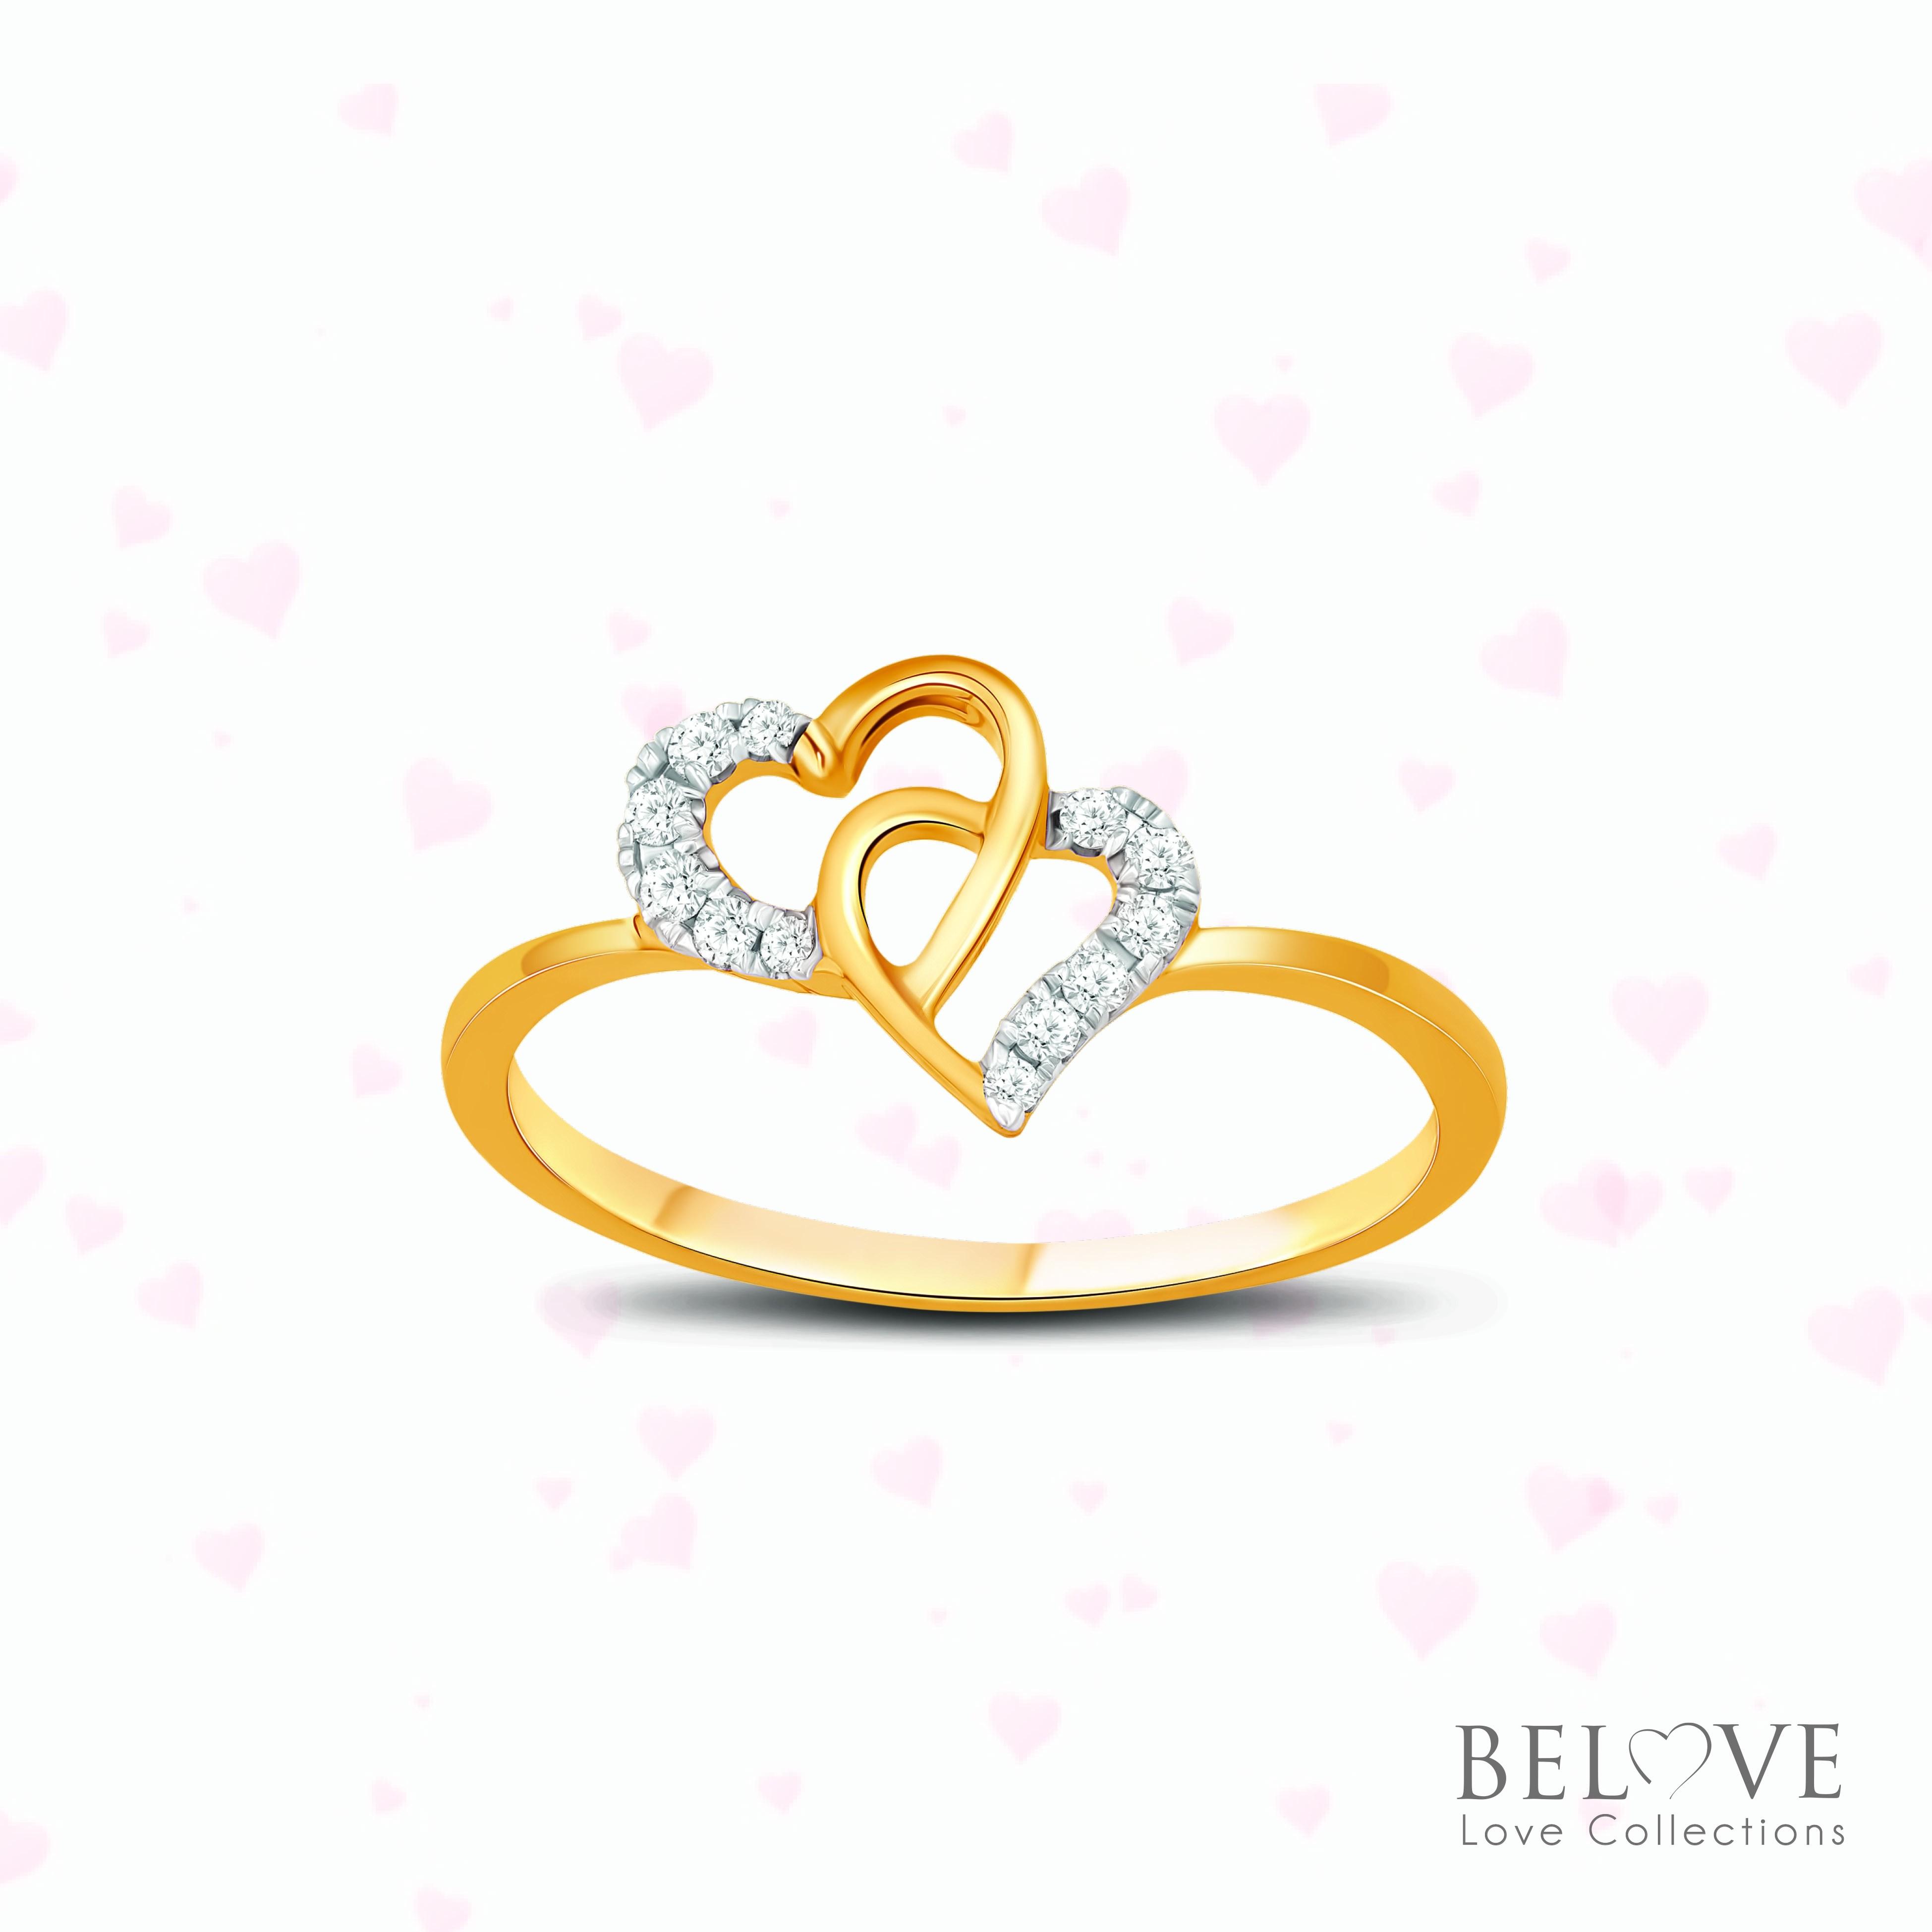 18K YELLOW GOLD DVS2018R-VL21 DIAMOND RING